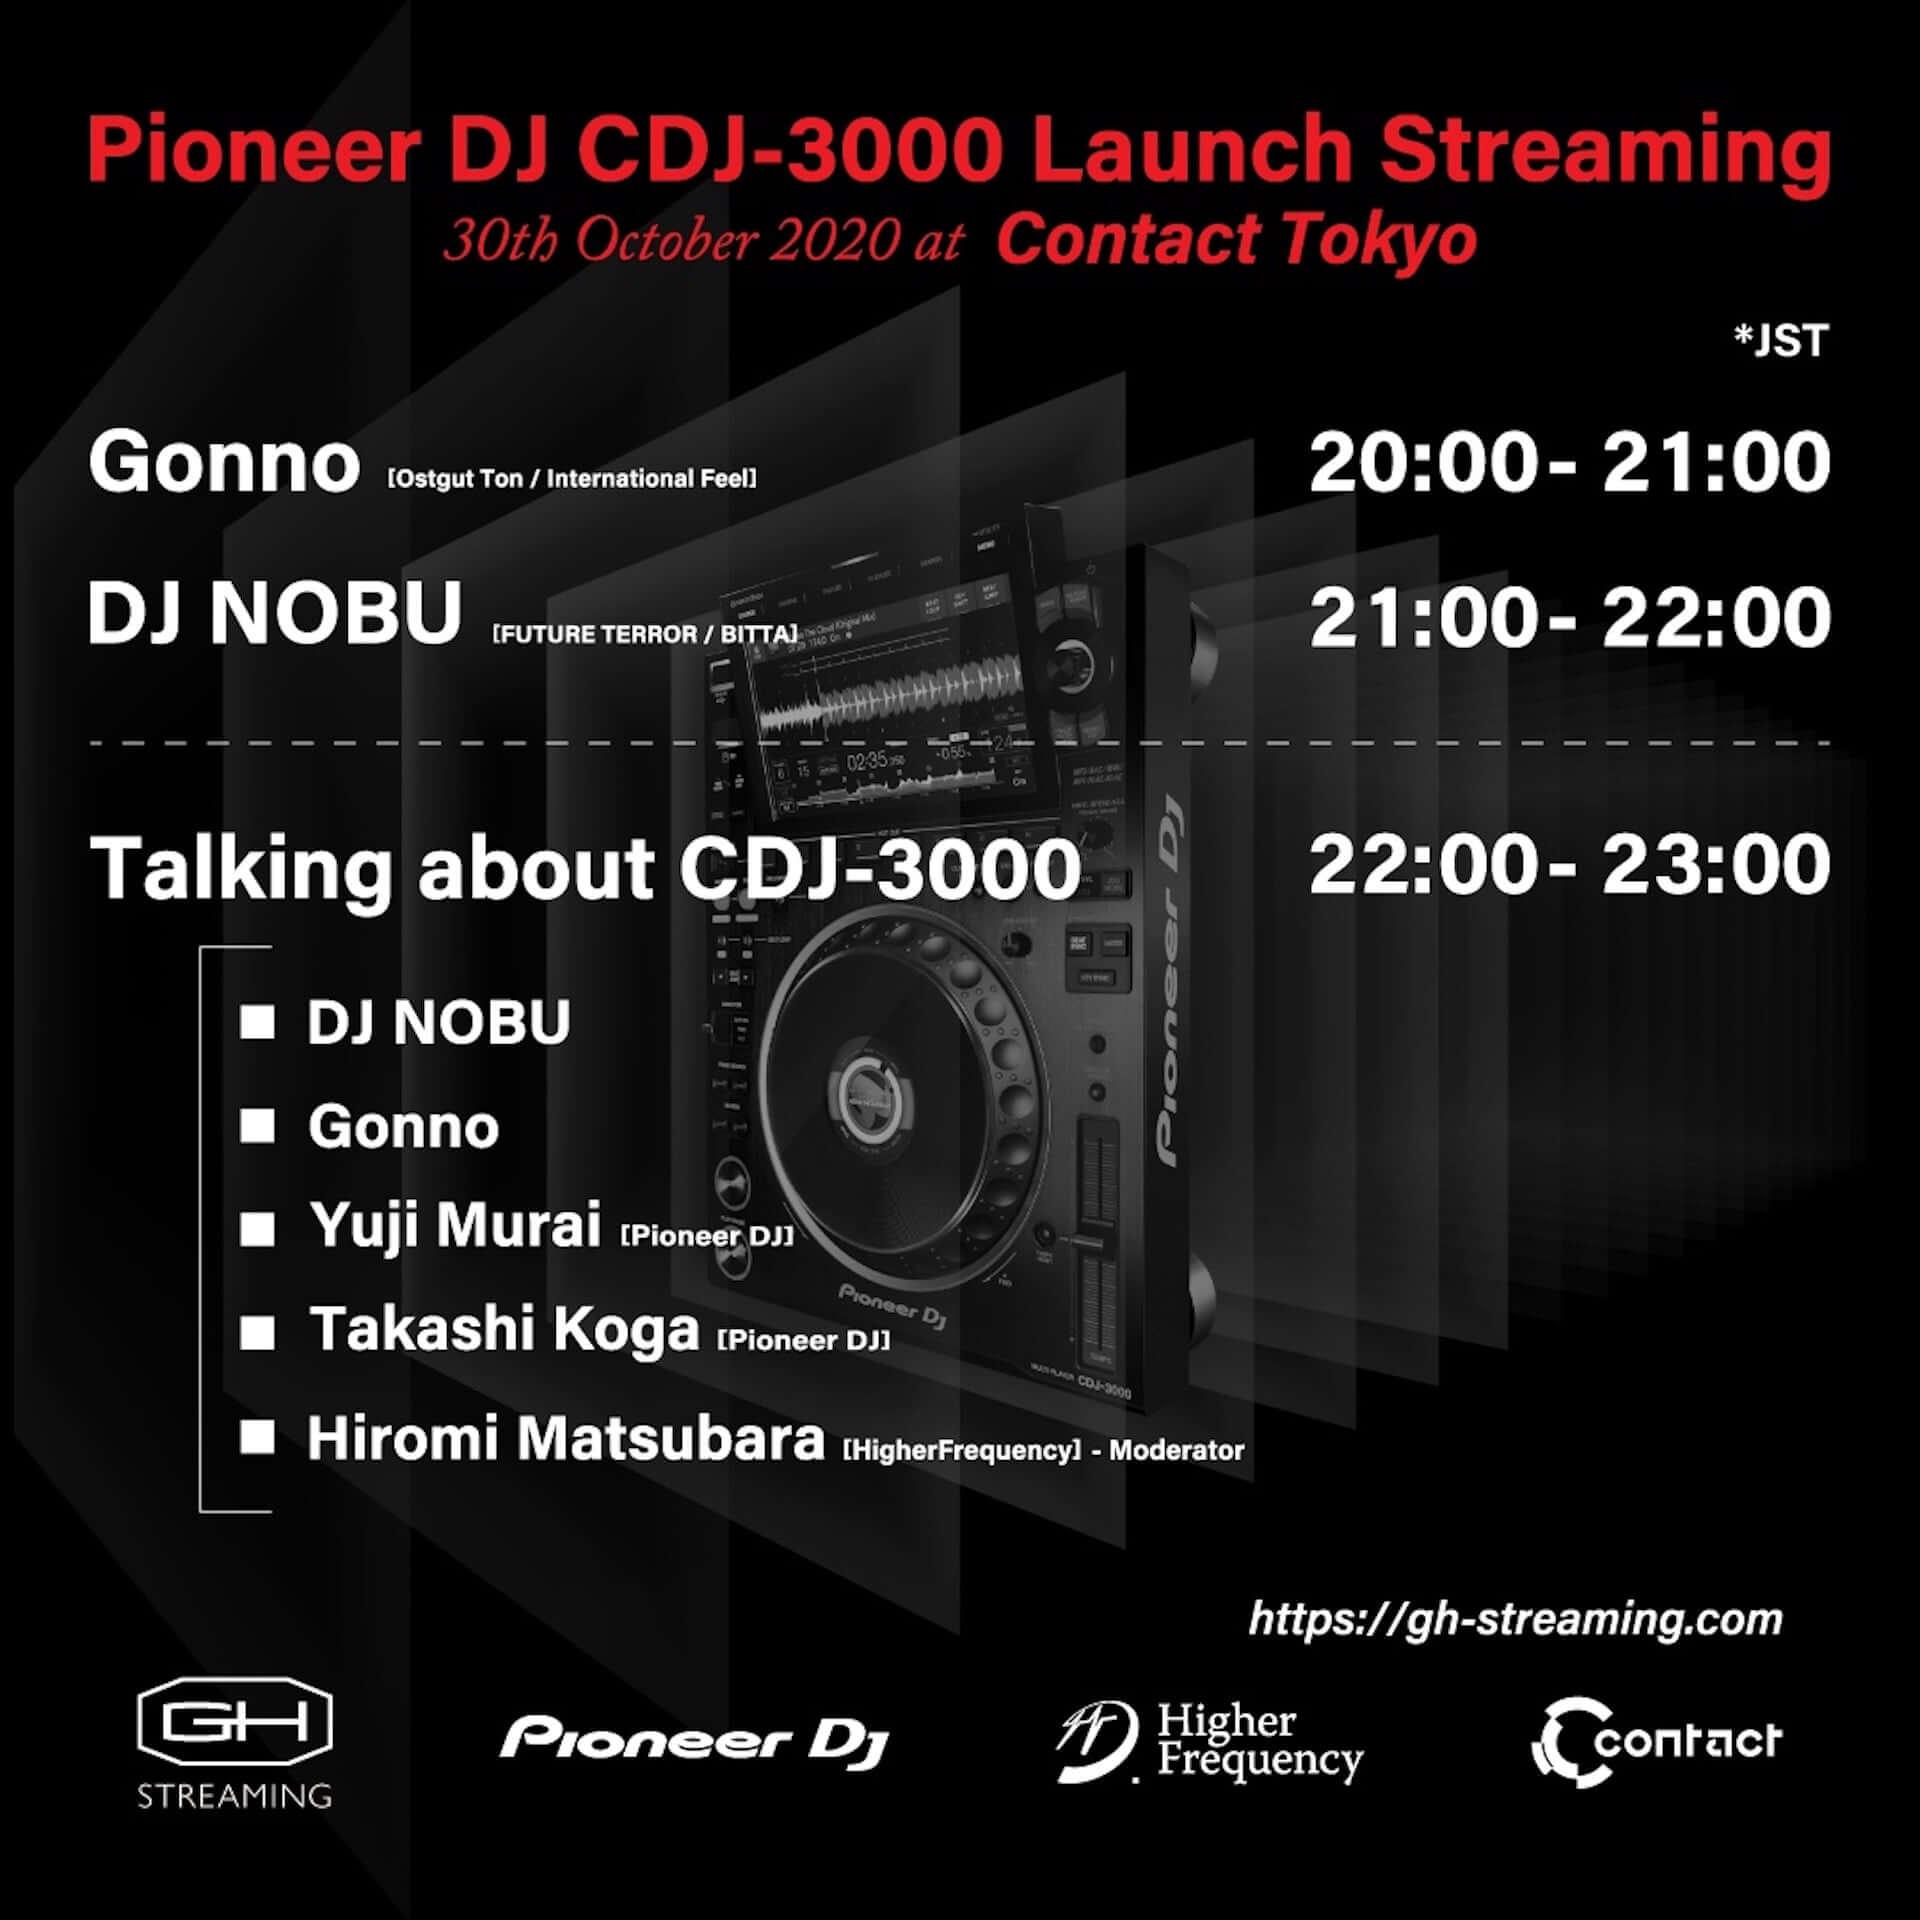 Pioneer DJ『CDJ-3000』のローンチパーティーが渋谷Contactにて明日開催!DJ Nobu、Gonno、SEKITOVA、okadadaらが出演 music201029_contact-cdj3000_5-1920x1920